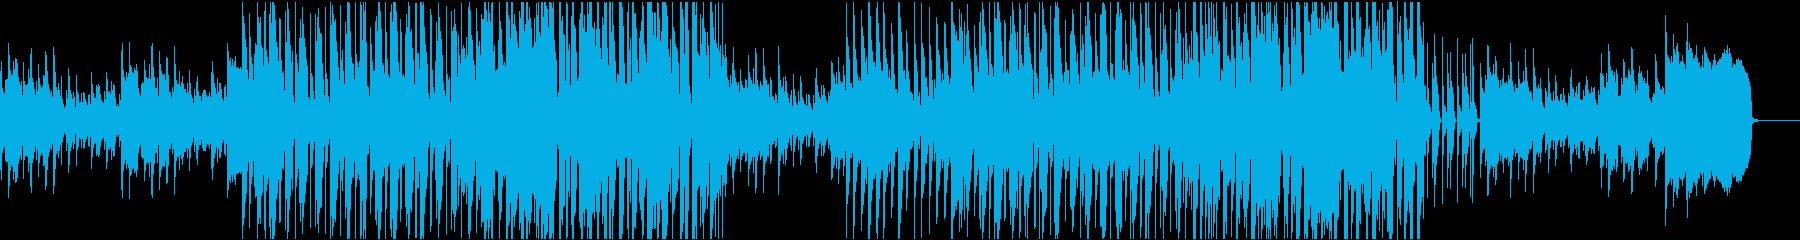 StockMusic34_CheesyStuffの再生済みの波形